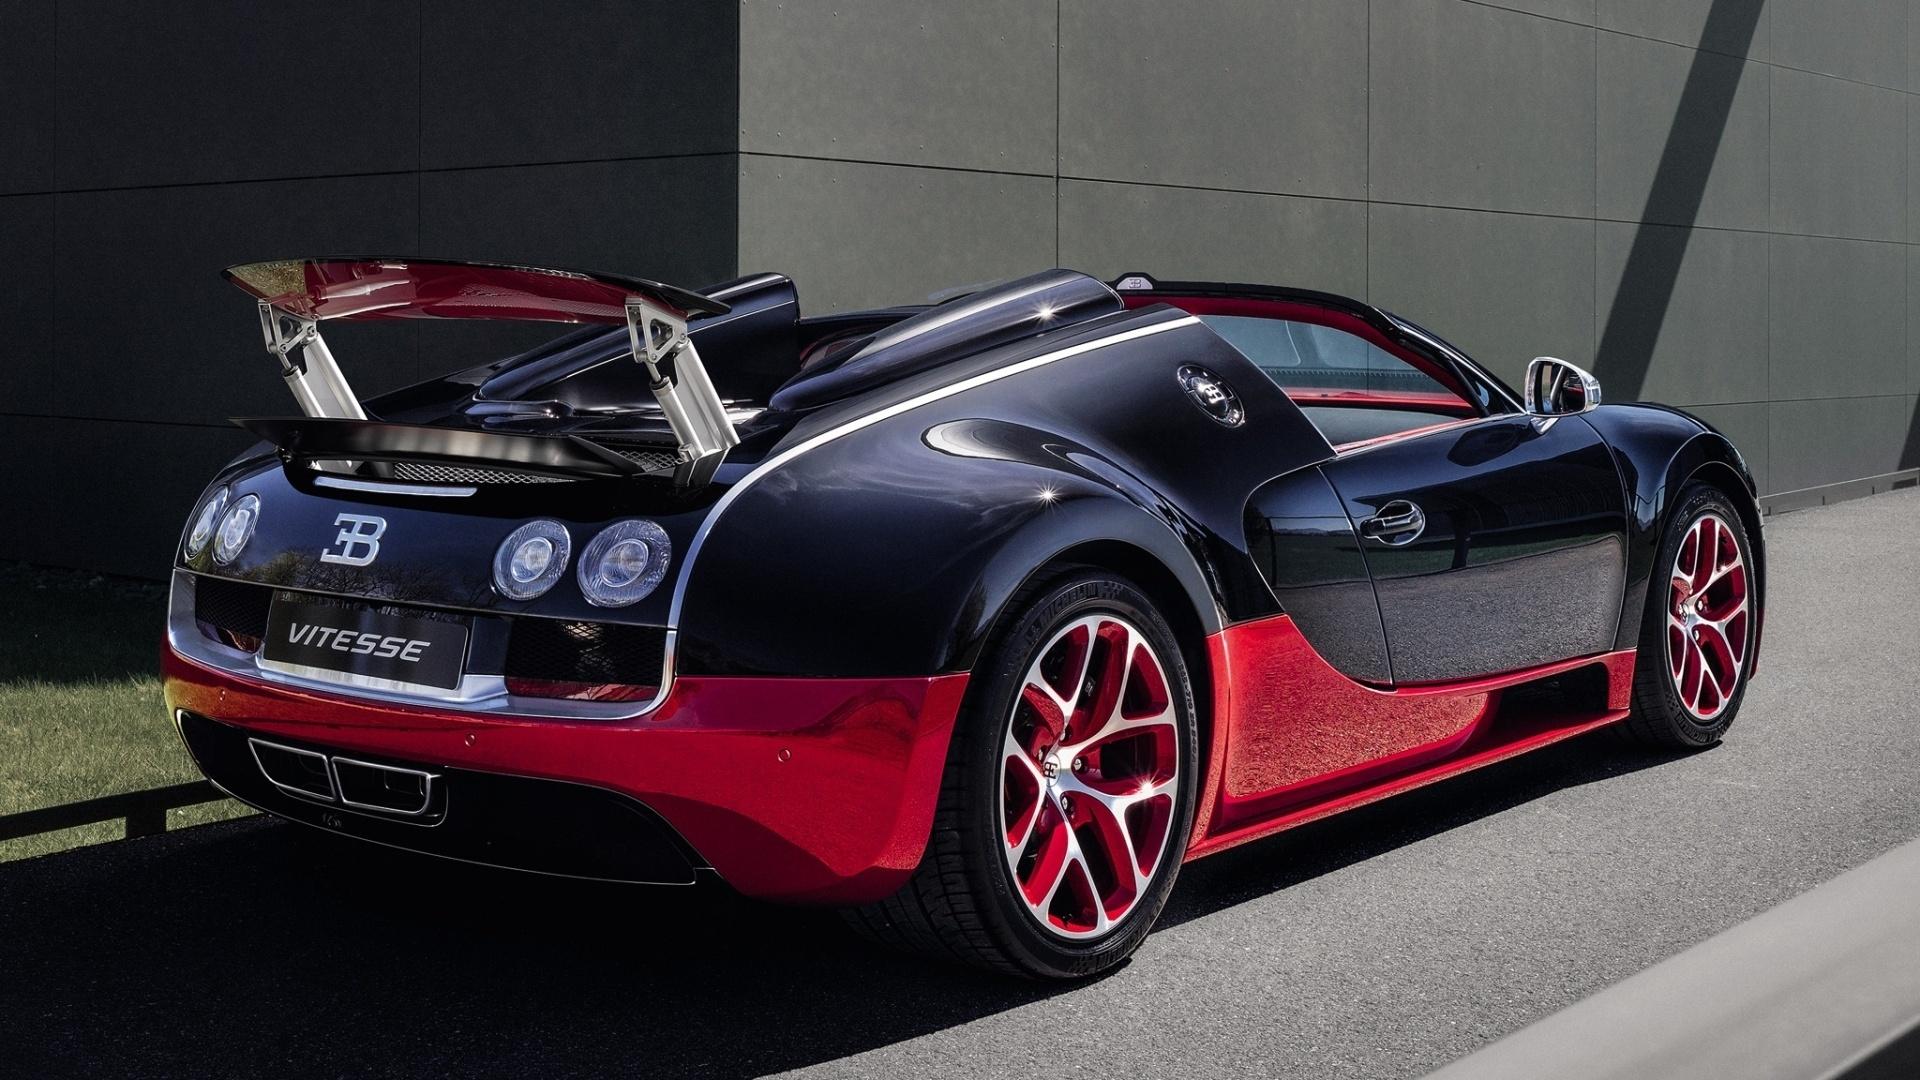 2018 bugatti veyron price.  bugatti bugatti price 2014 40 background wallpaper for 2018 bugatti veyron price